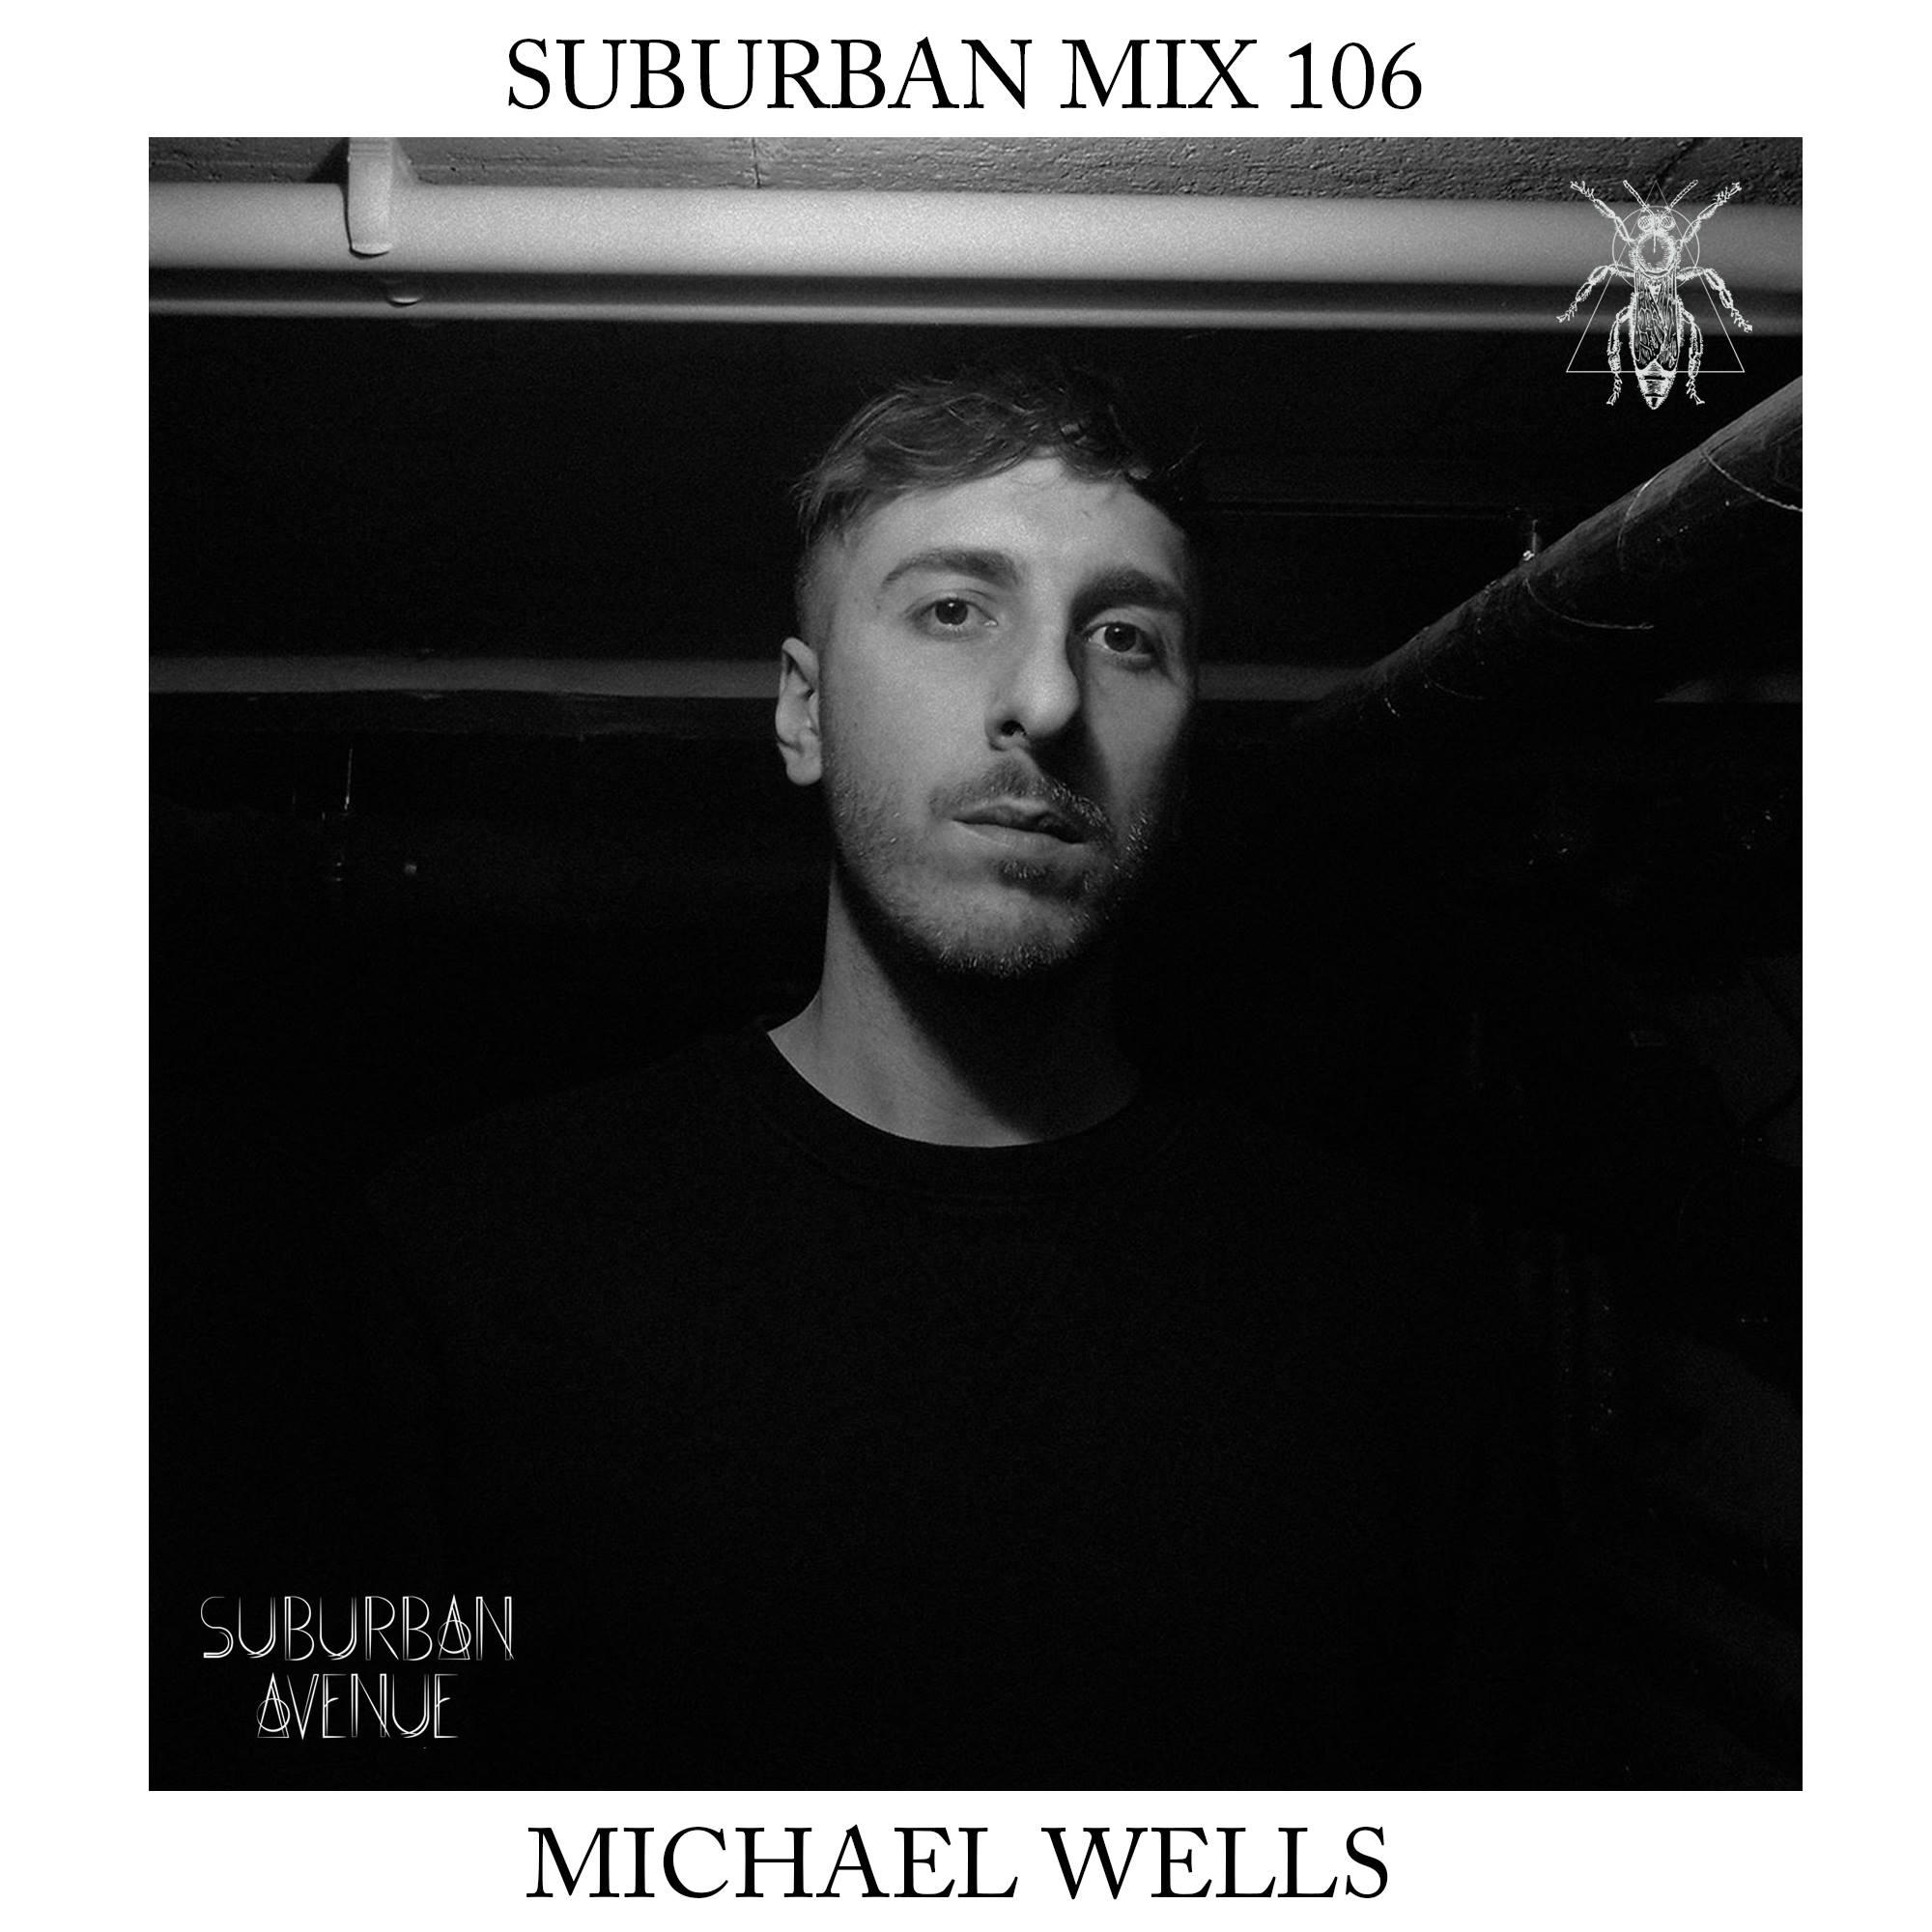 Suburban Mix 106 - Michael Wells